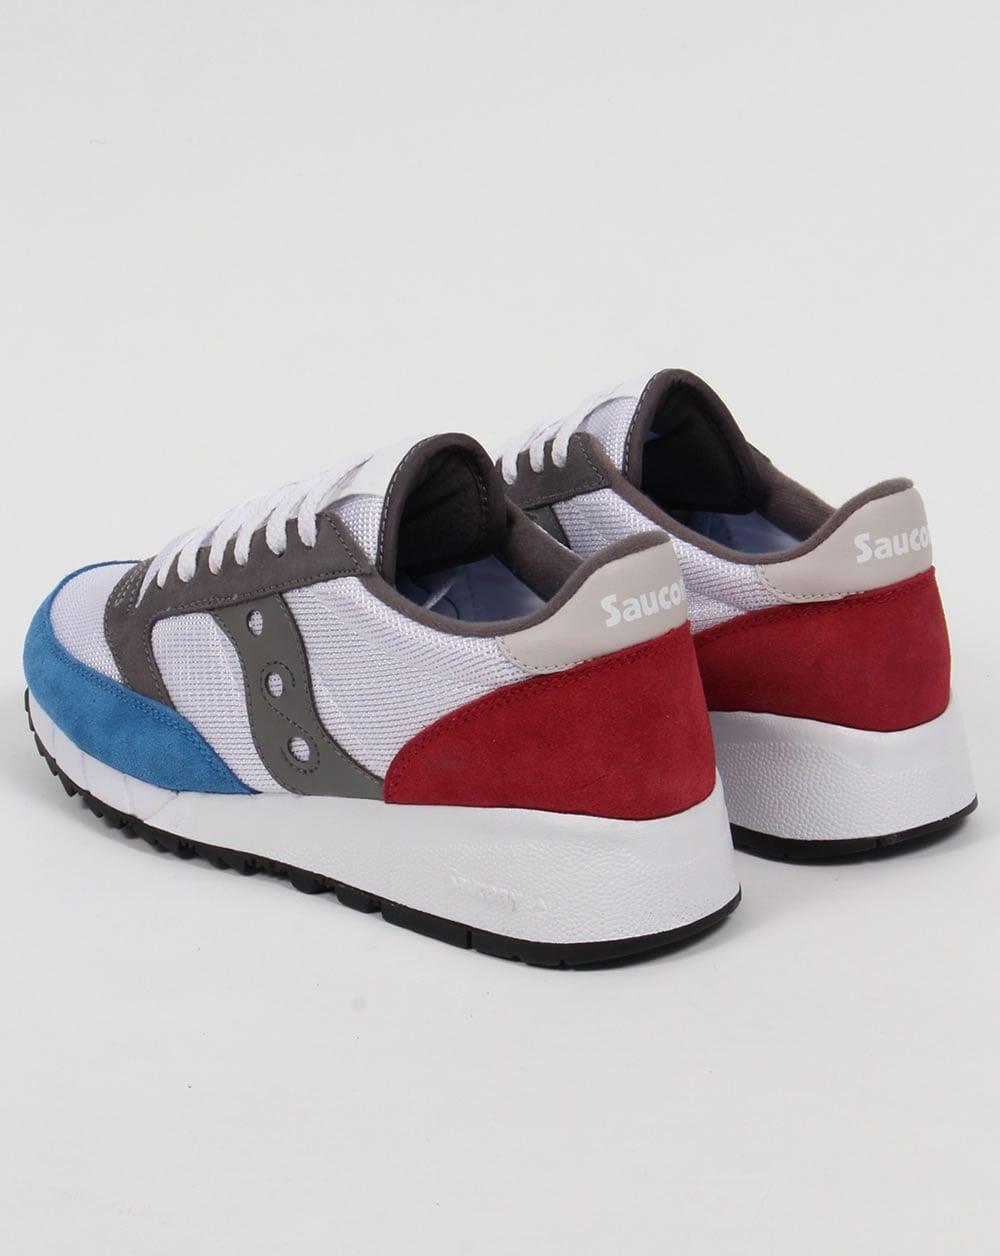 d9ef35de1f Saucony Jazz 91 Trainers White/Red/Blue